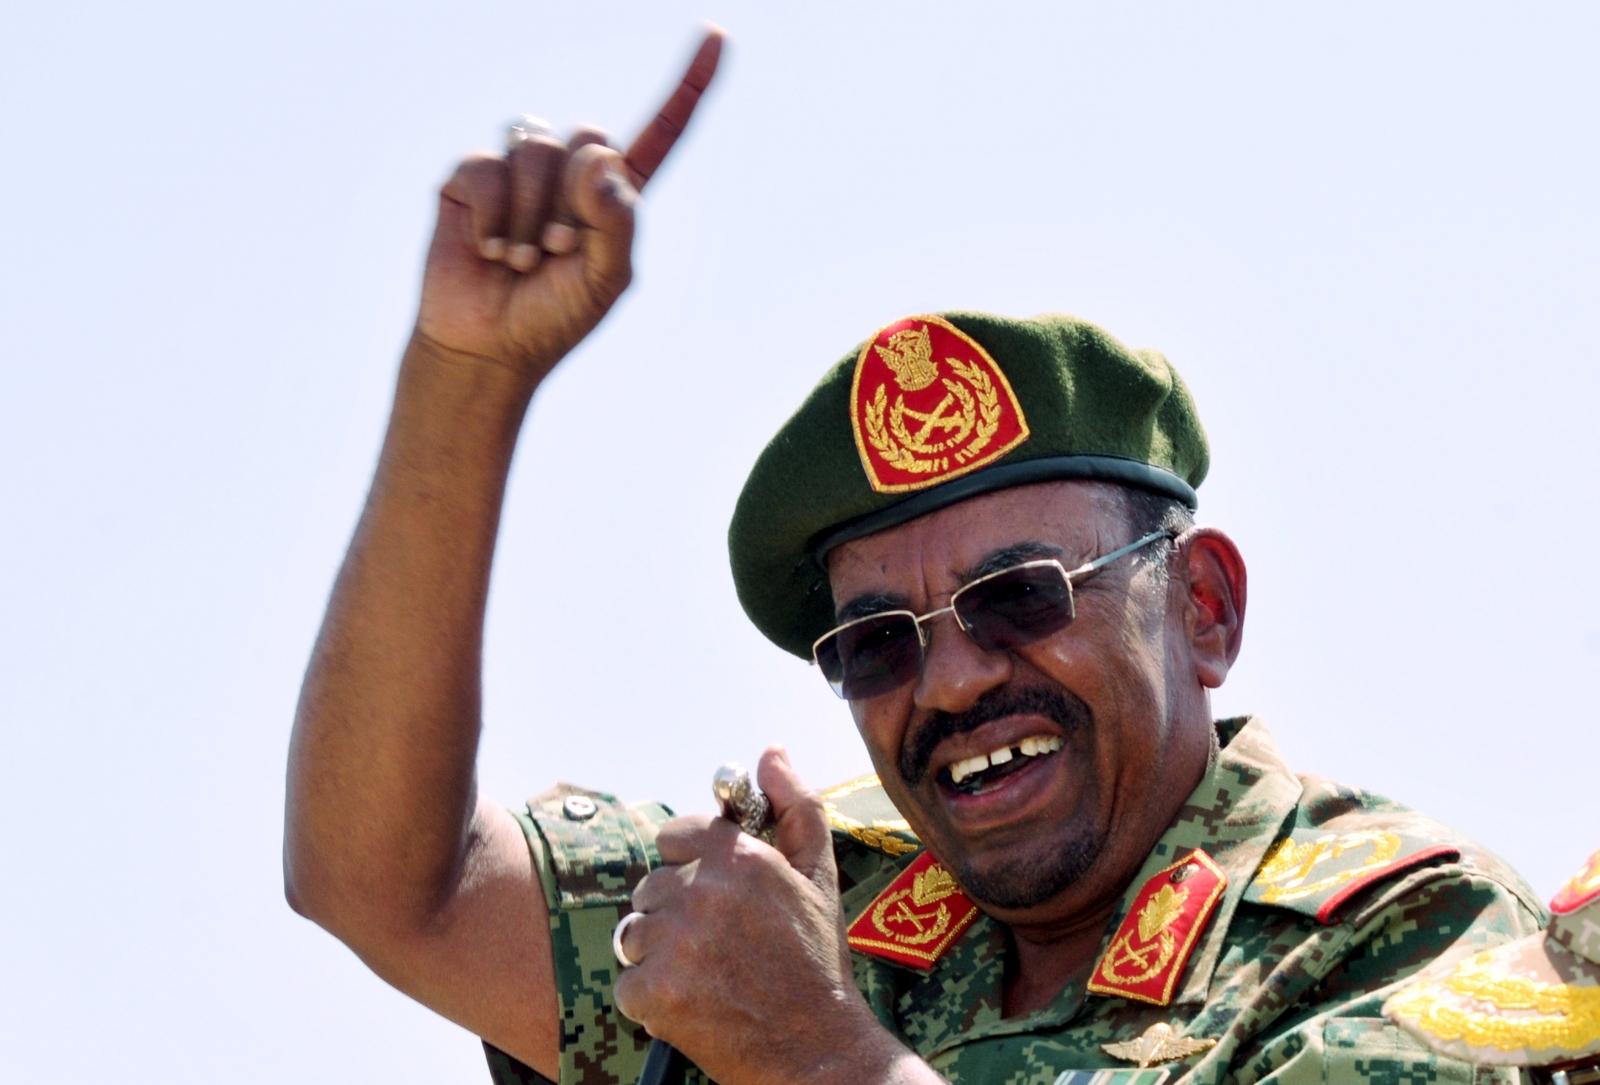 Sudan's President Omar Hassan al-Bashir